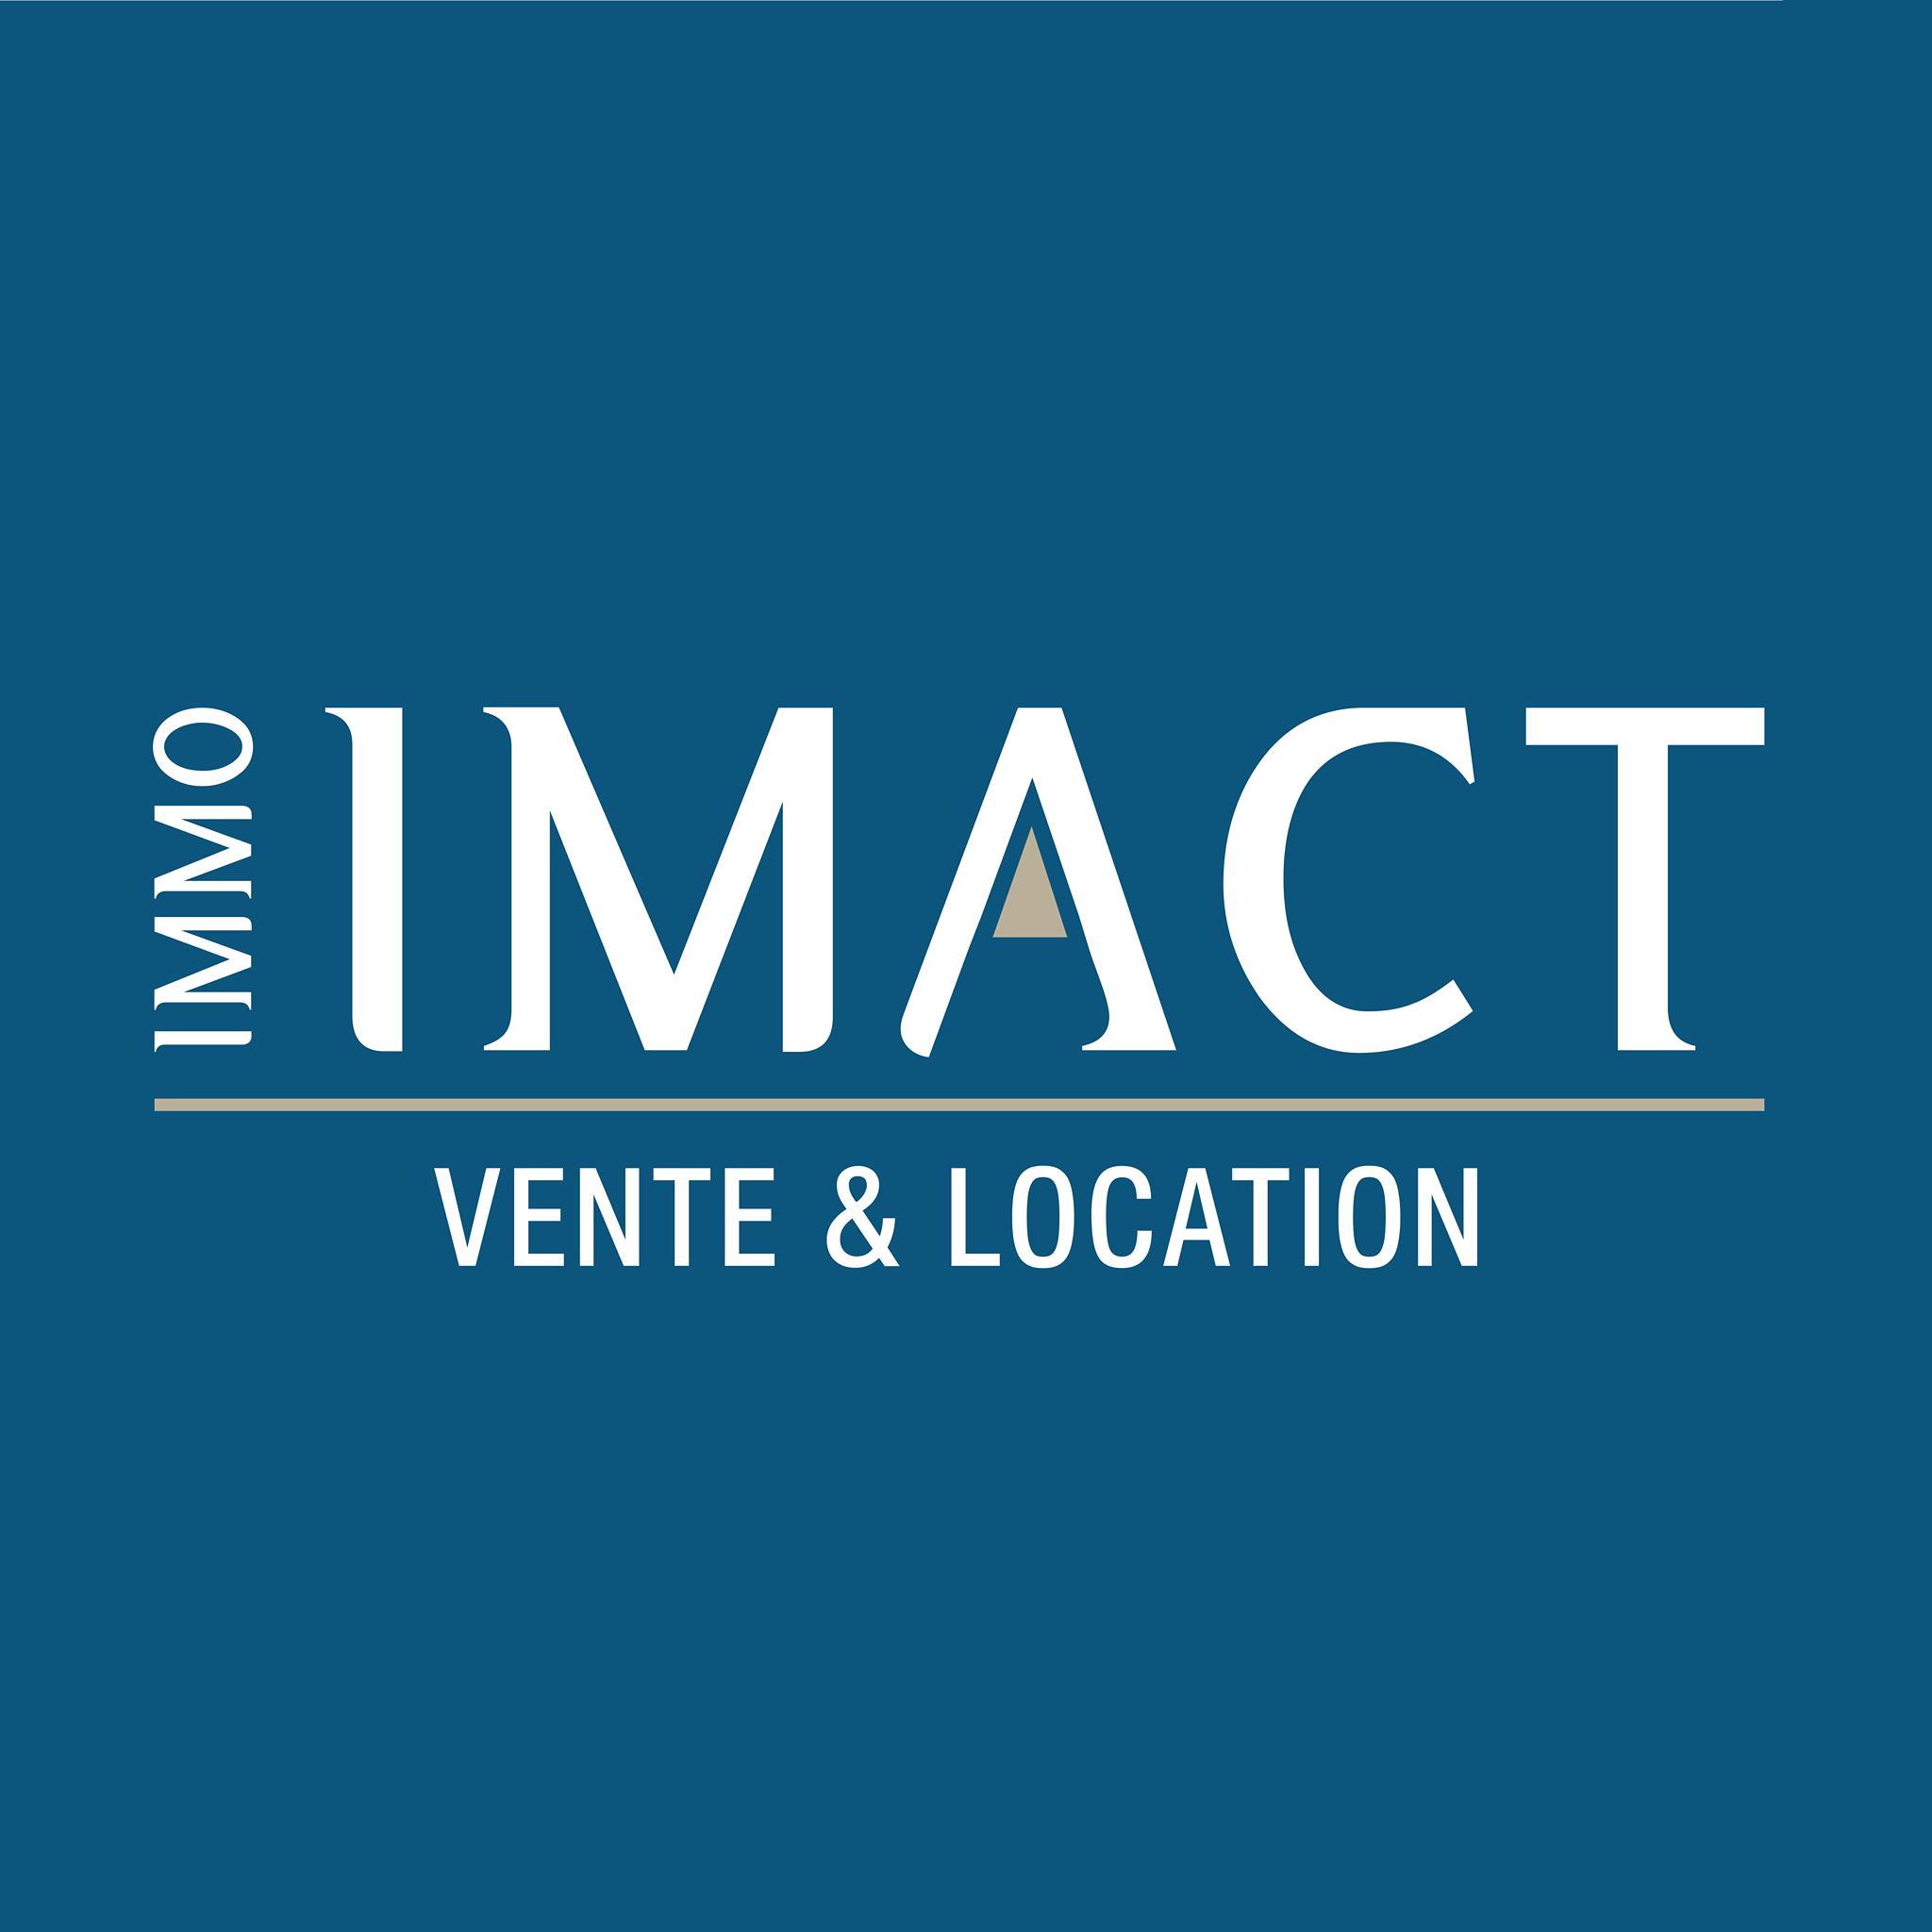 Immo Imact